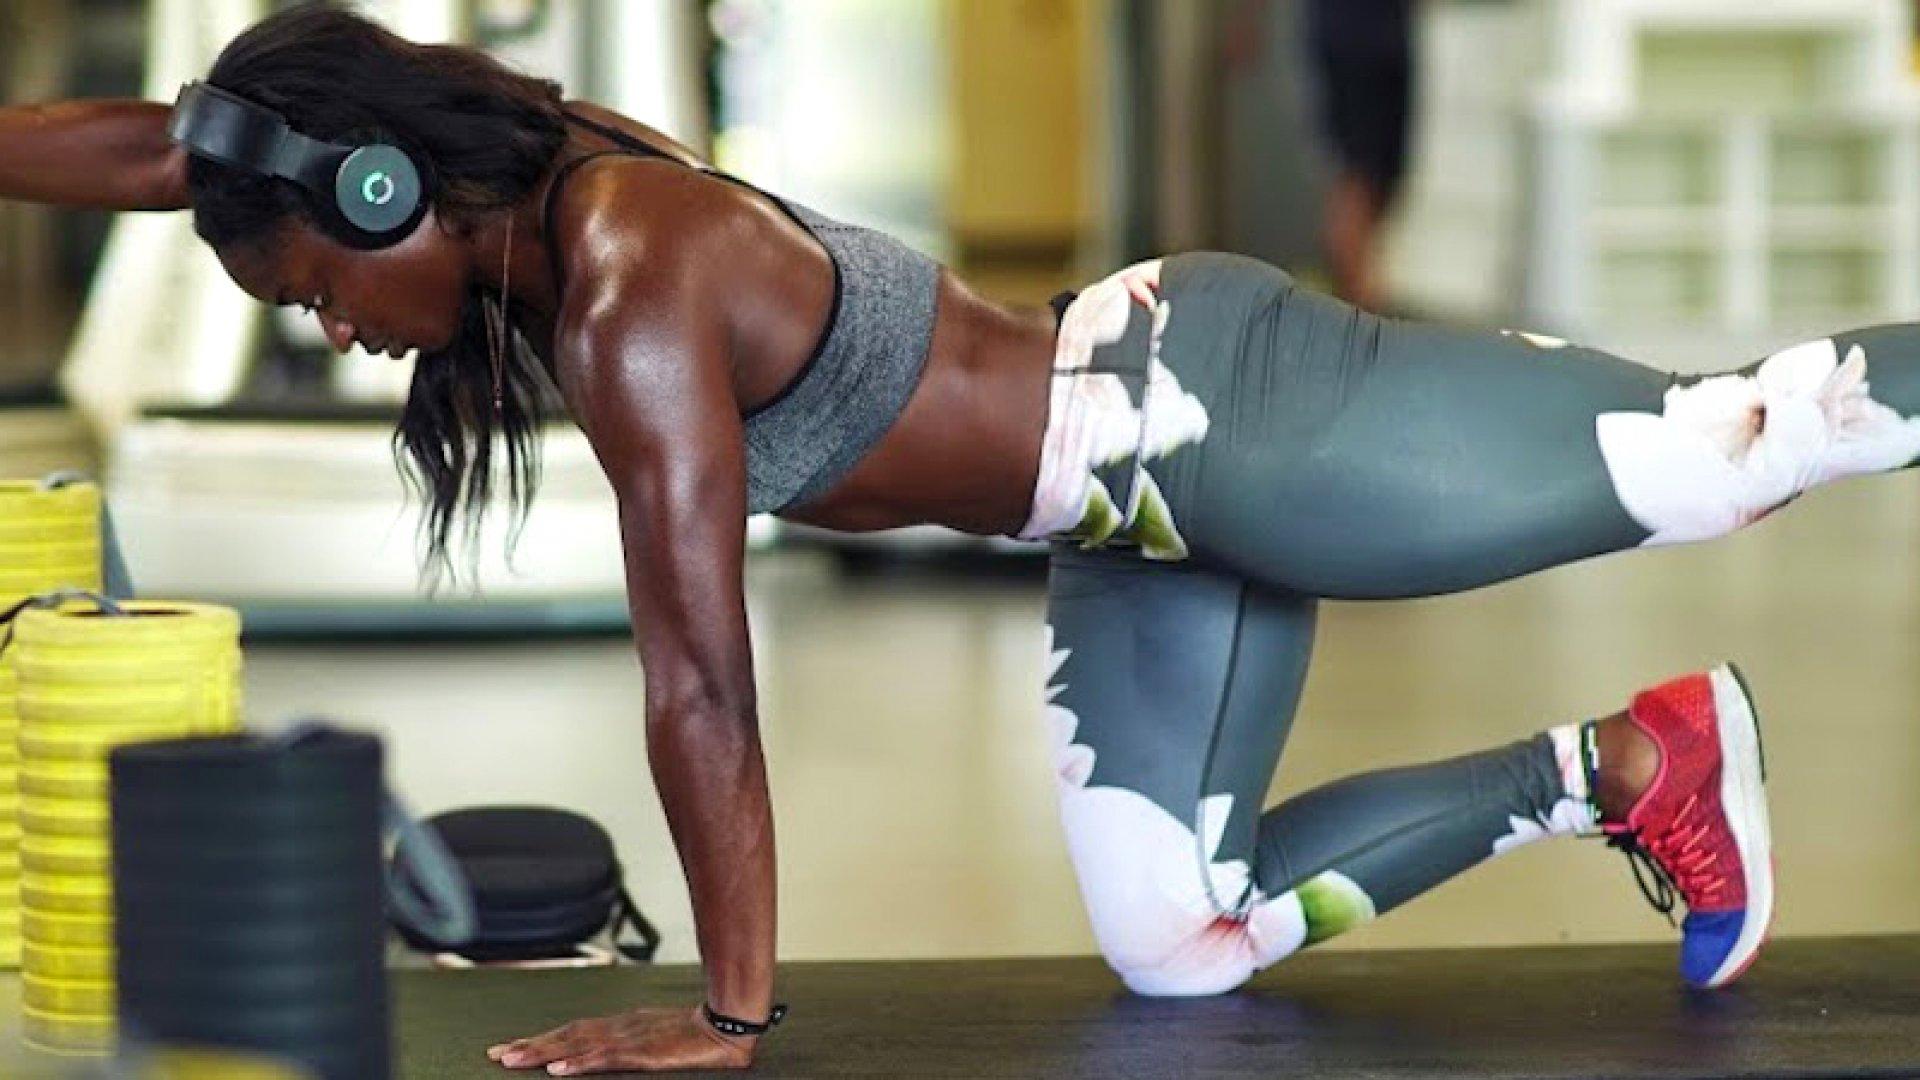 Sprinter Hafsatu Kamara of Sierra Leone training for the Rio Olympics with Halo Sport